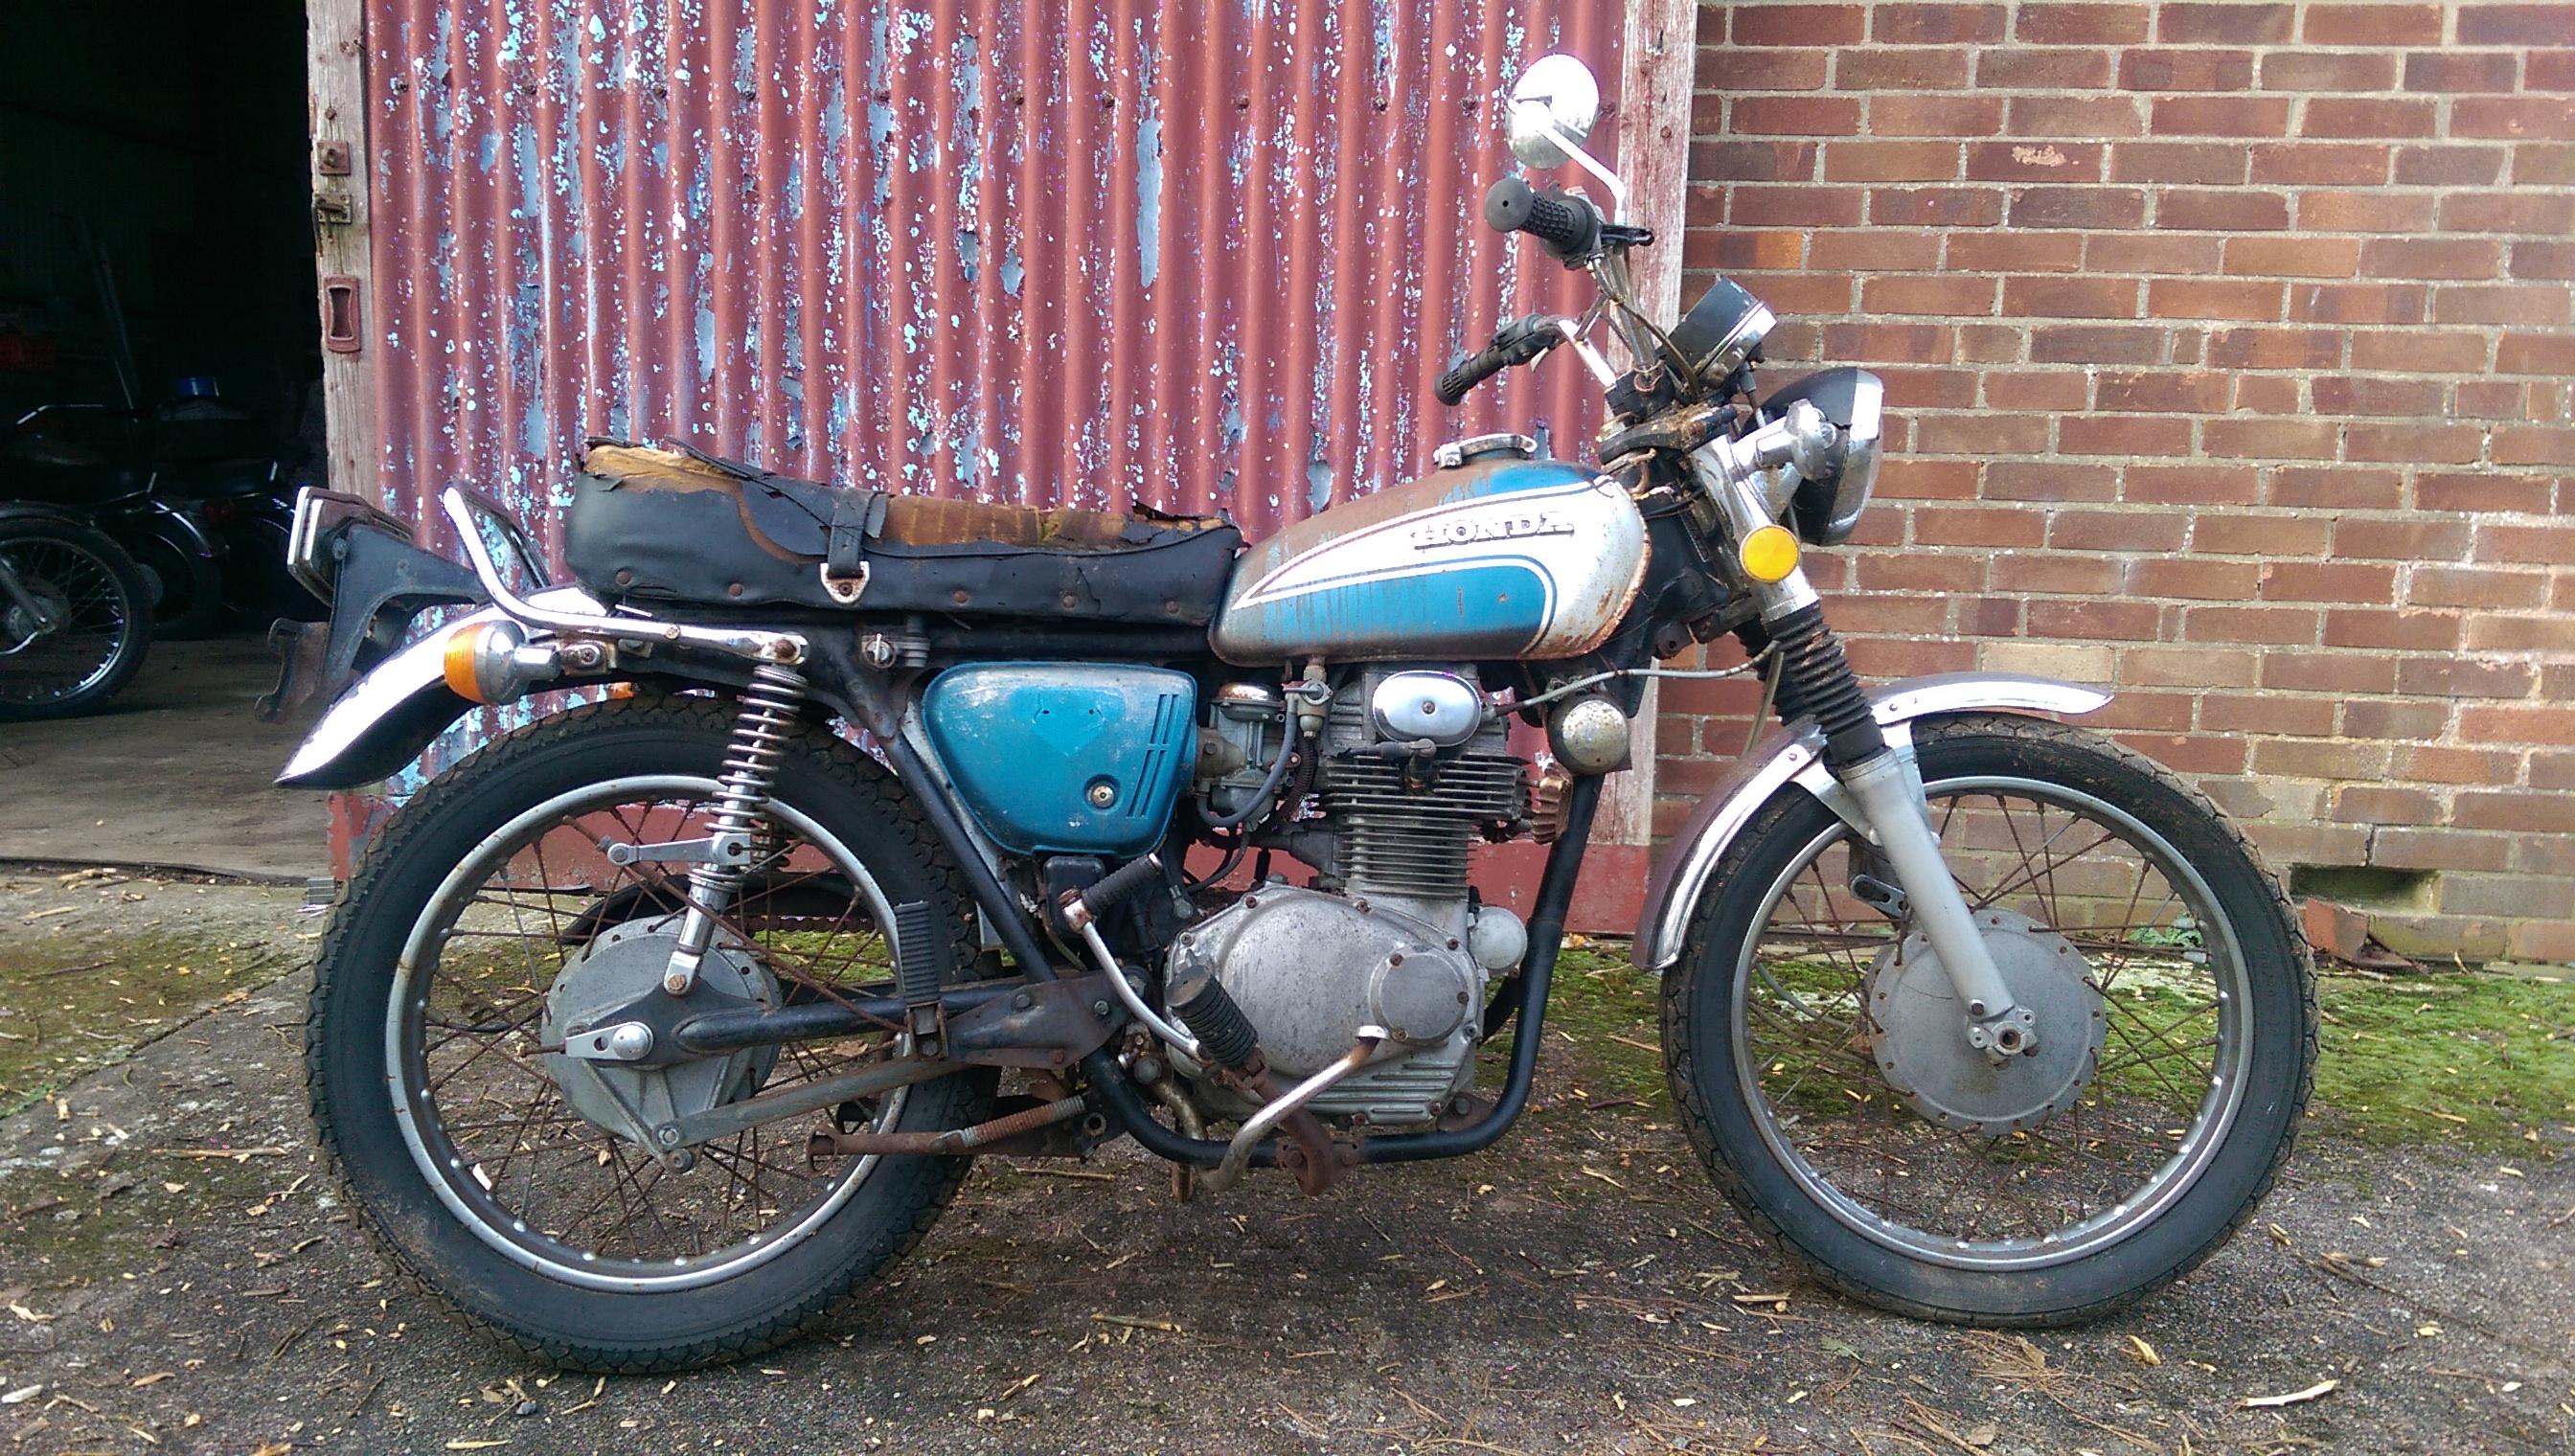 Barn Find Classic Bikes For Sale | Burton Bike Bits